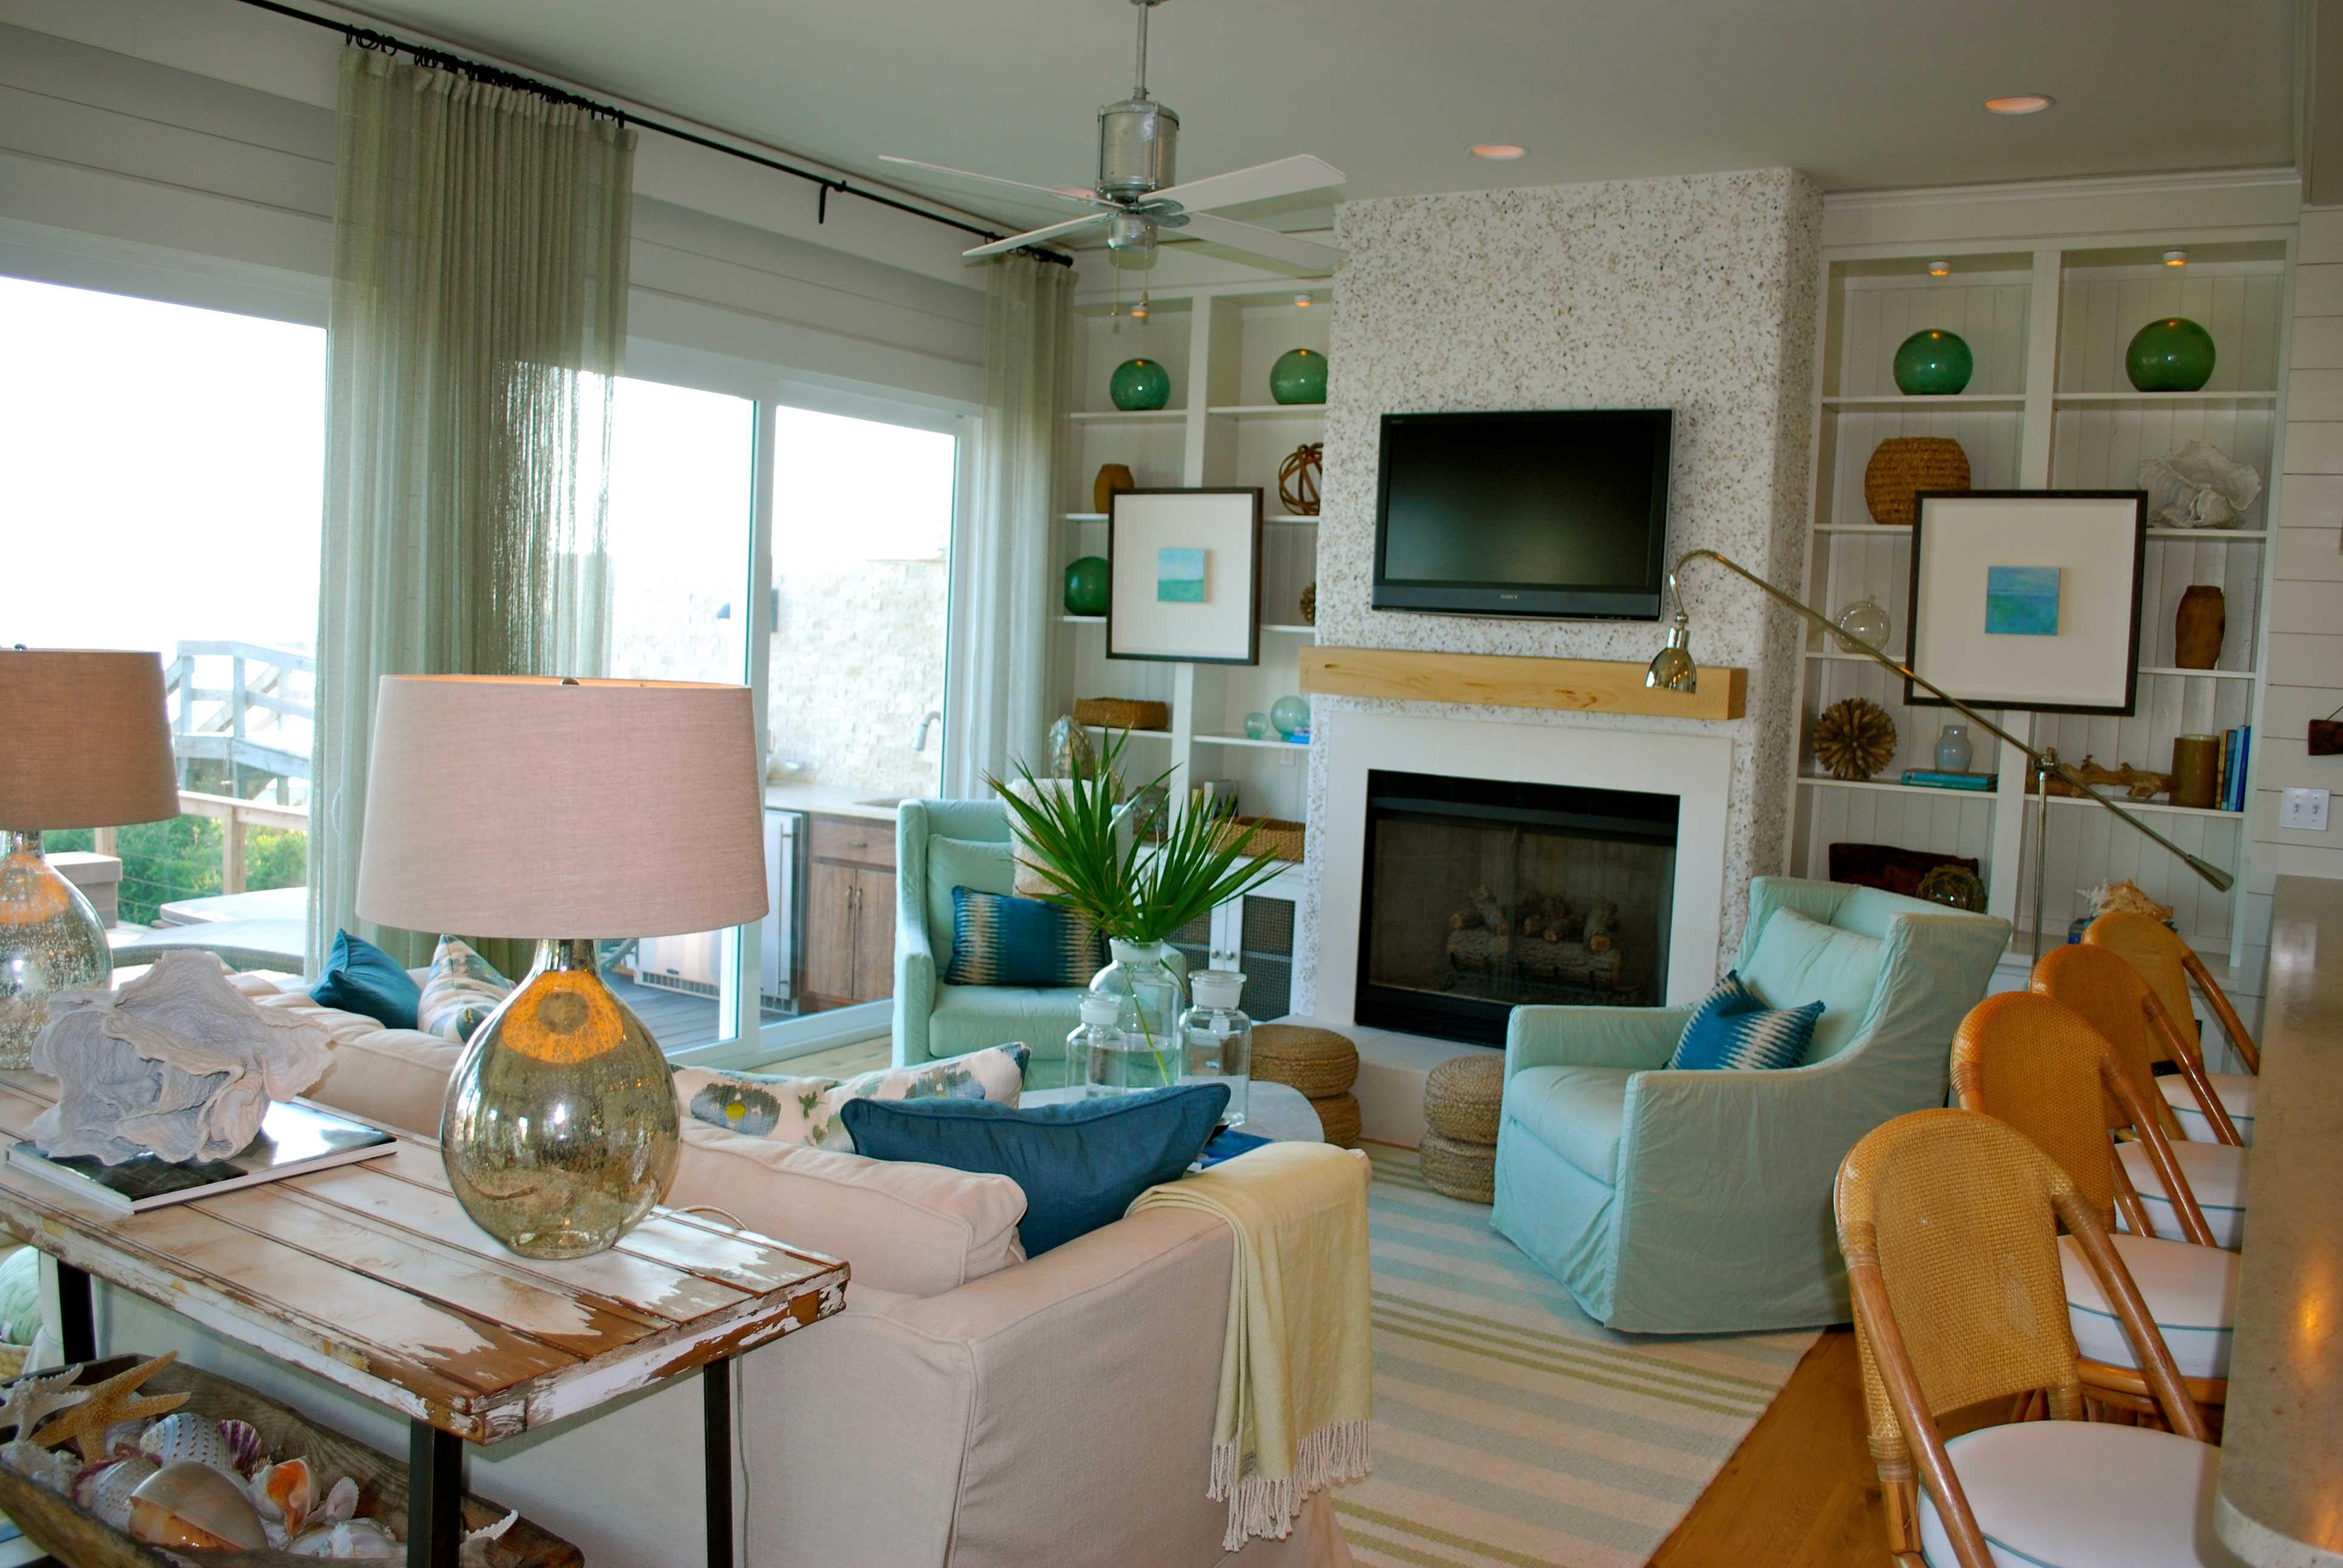 Furniture Miraculous Nashville Furniture With Nice Design